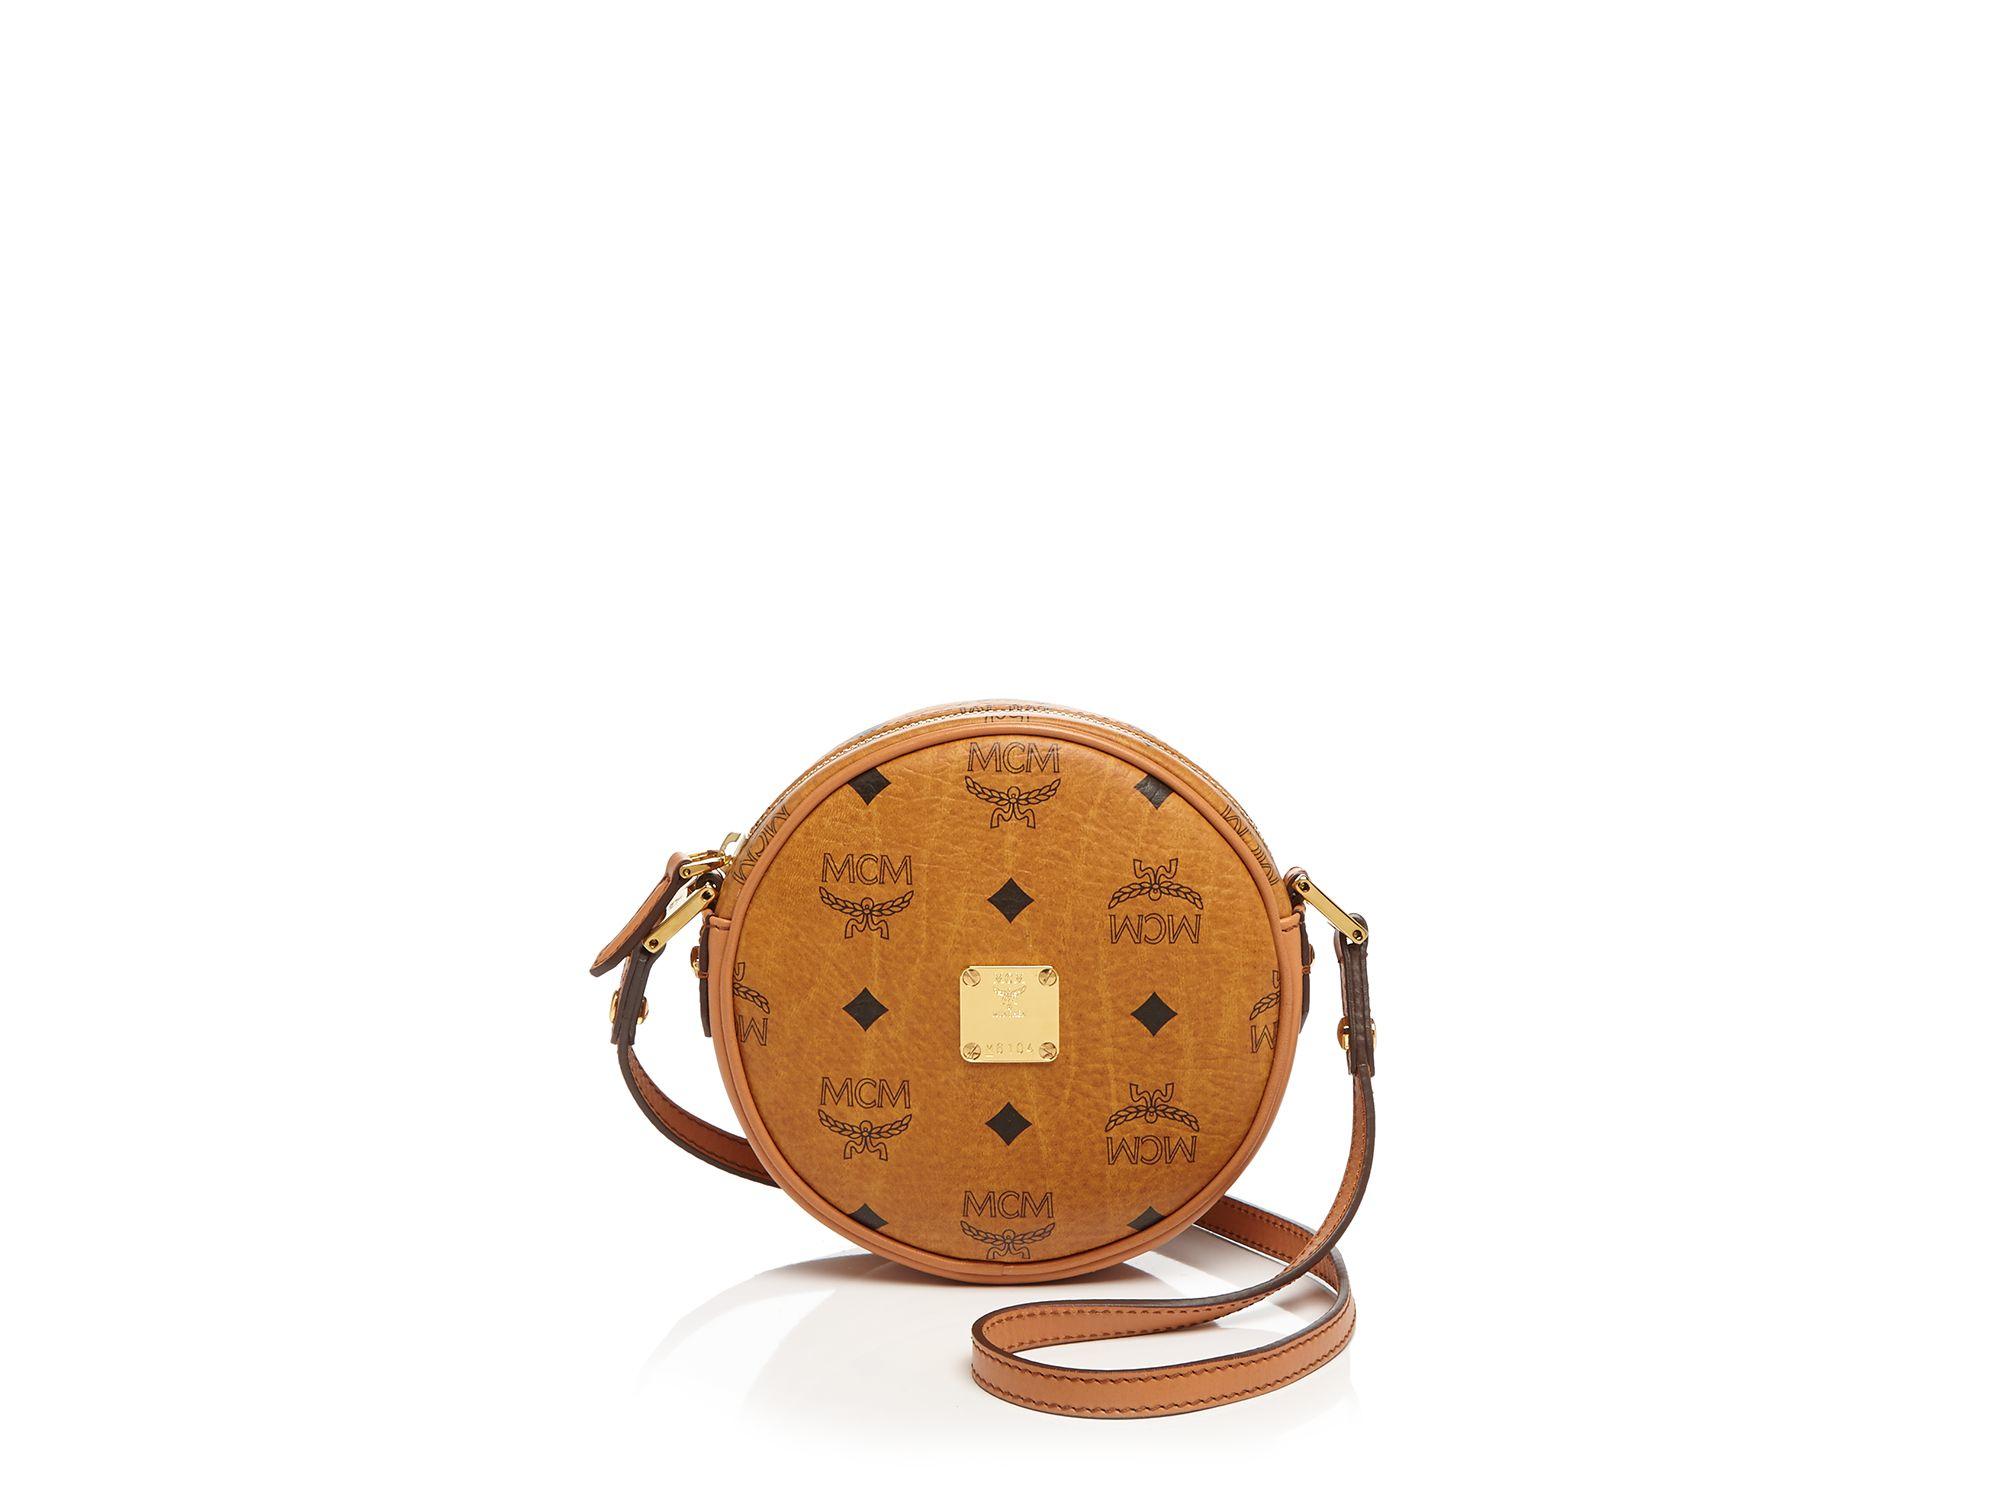 MCM Crossbody - Heritage Line Tambourine Small in Cognac (Brown)